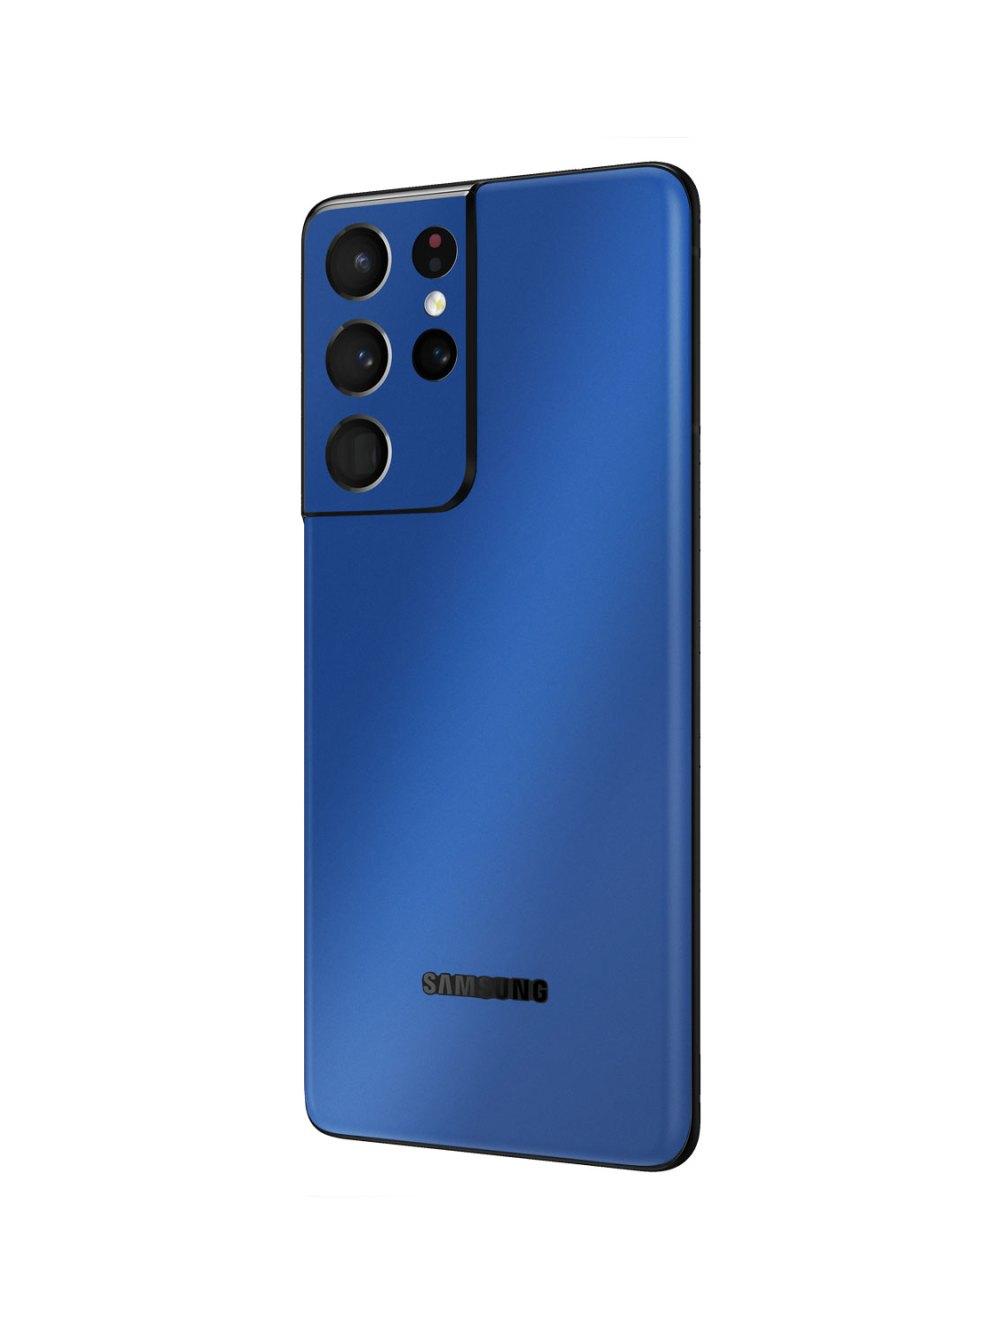 Gloss Royal Blue Skin Wrap for Samsung Galaxy S21 Ultra